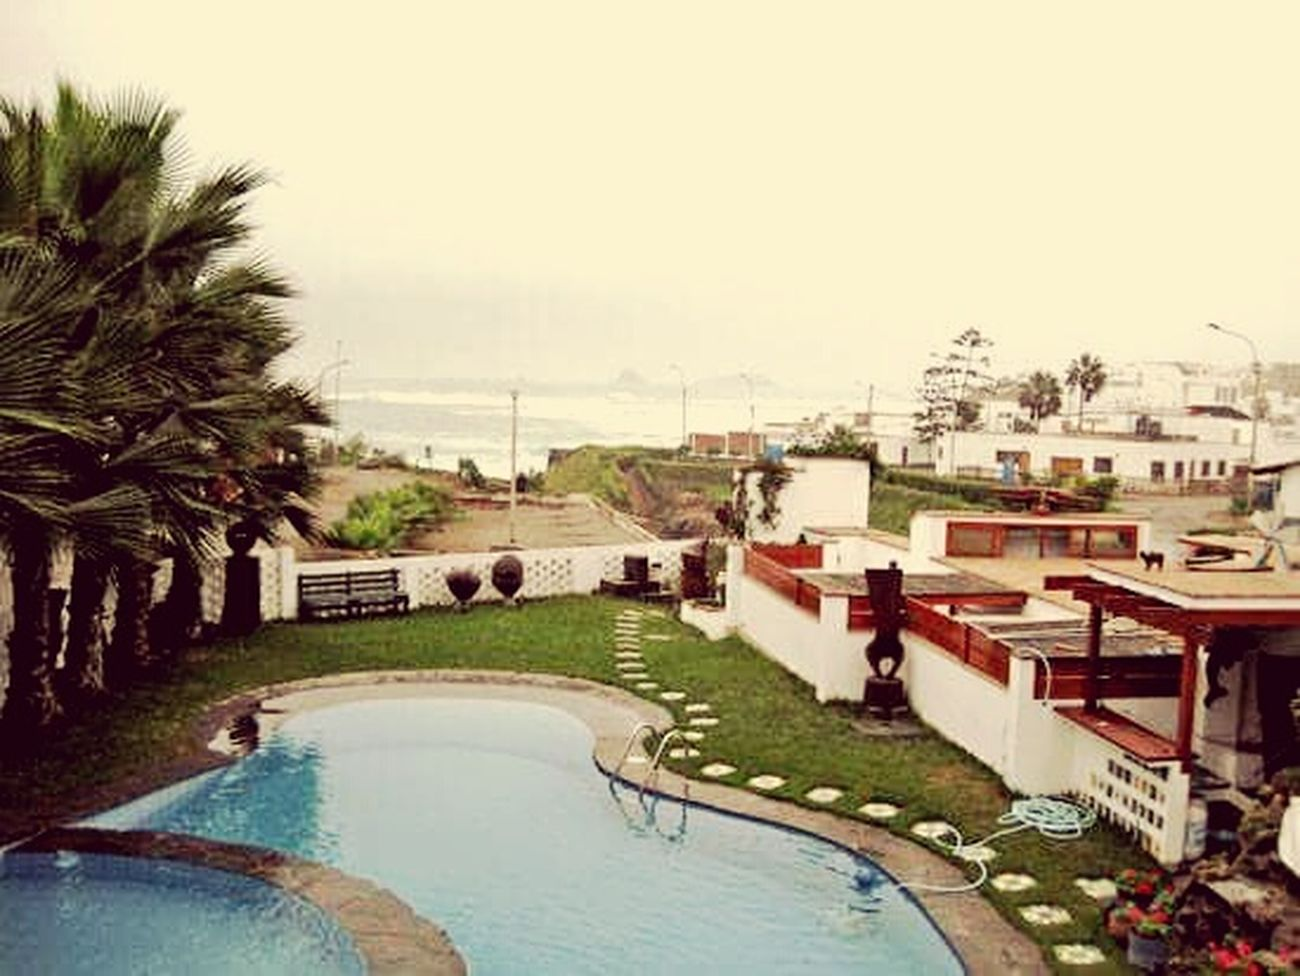 Surfing Hotel Sol Lima-Perú Casabarco Piscina Playa PuntaHermosa Smail :) Swimming